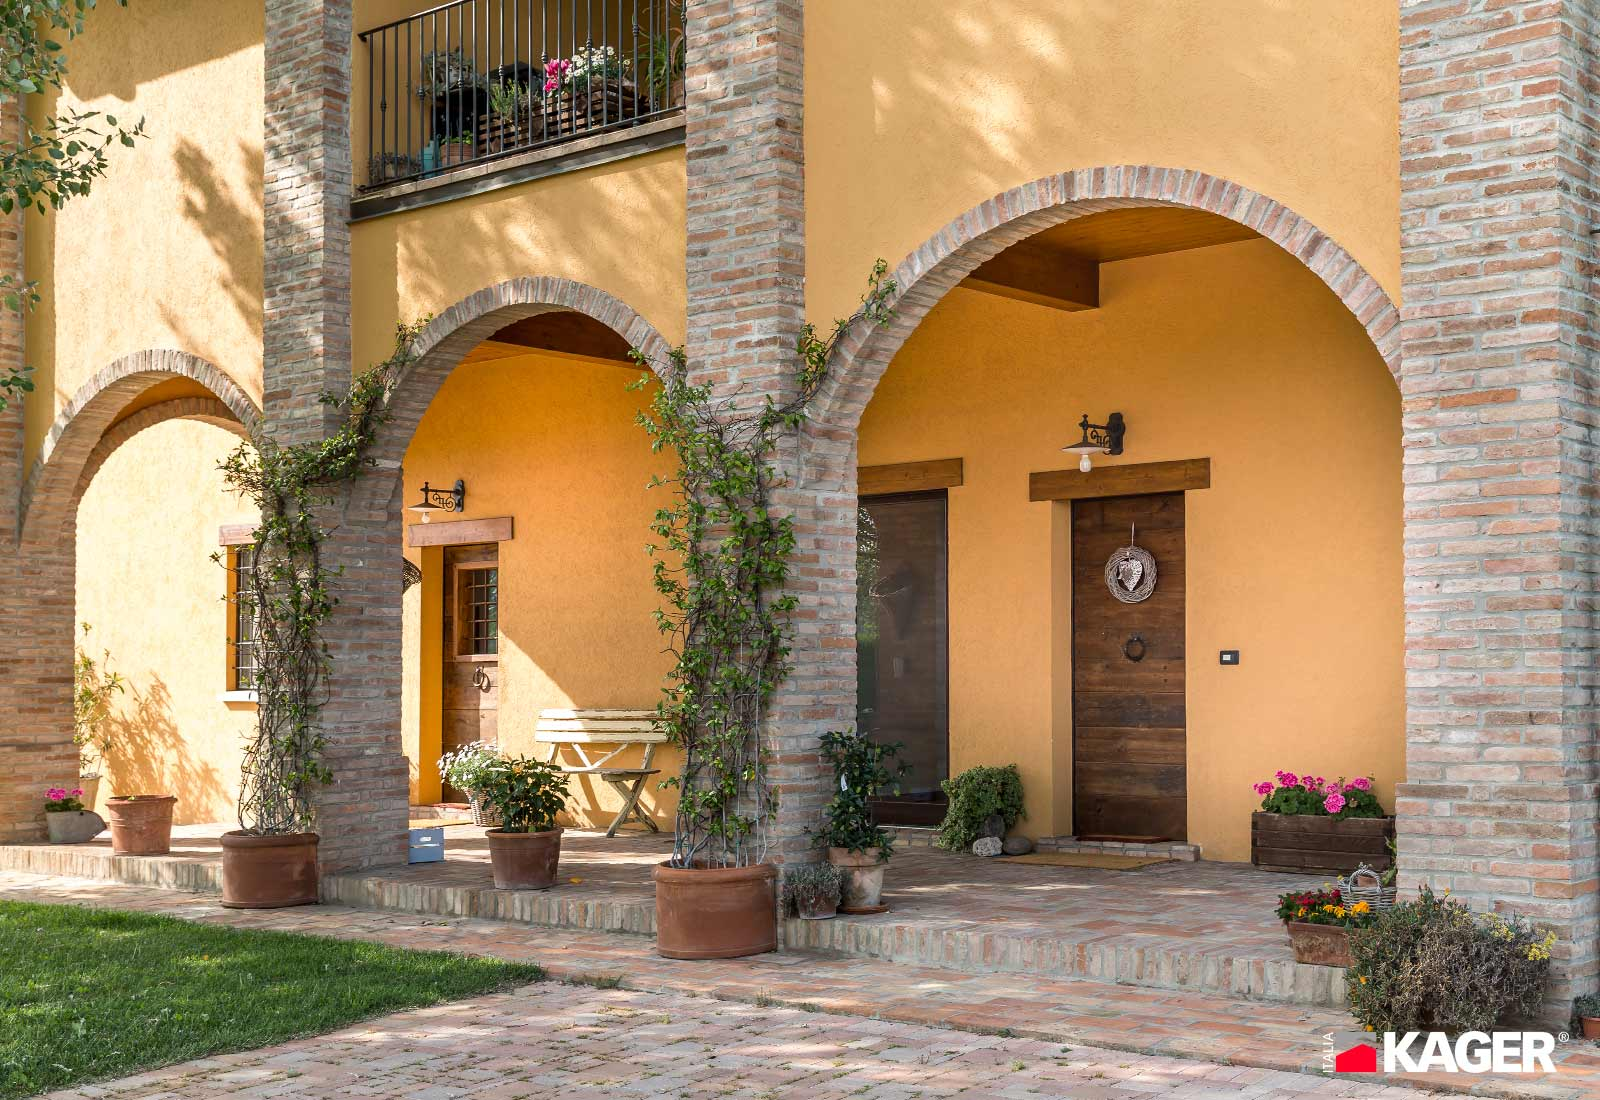 Casa-in-legno-Ferrara-Kager-Italia-08